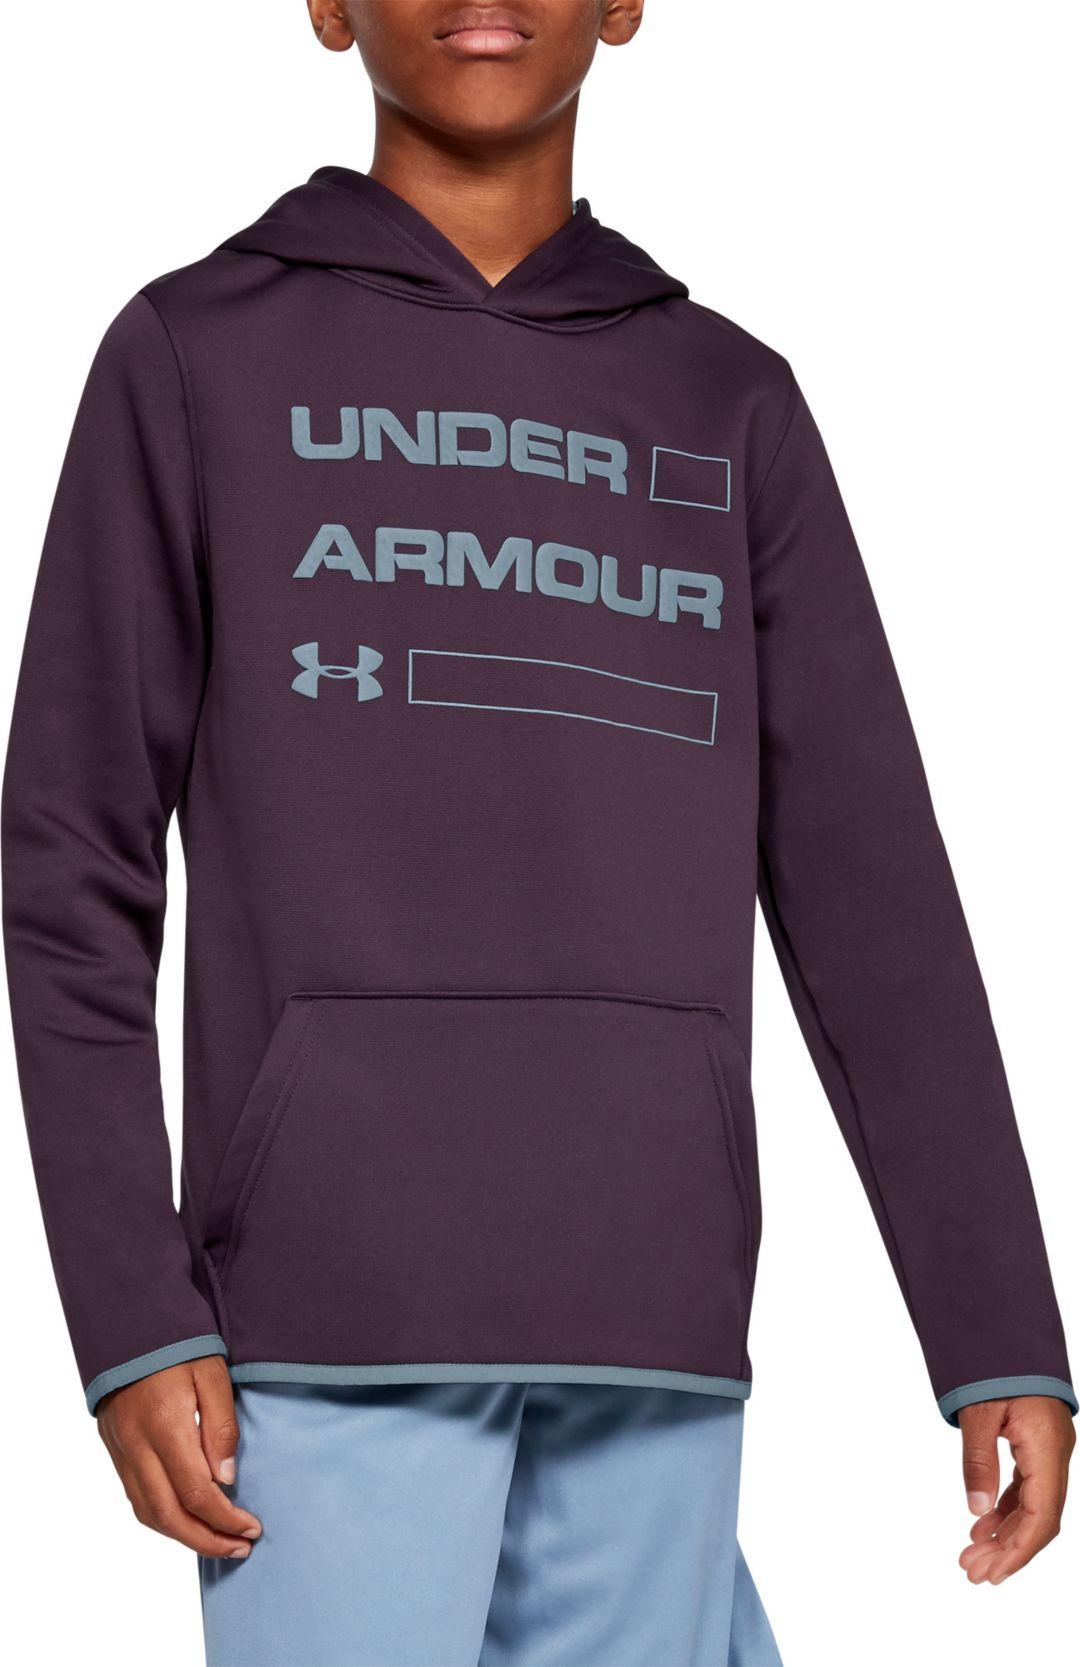 3832518f Under Armour Boy's Armour Fleece Wordmark Hoodie